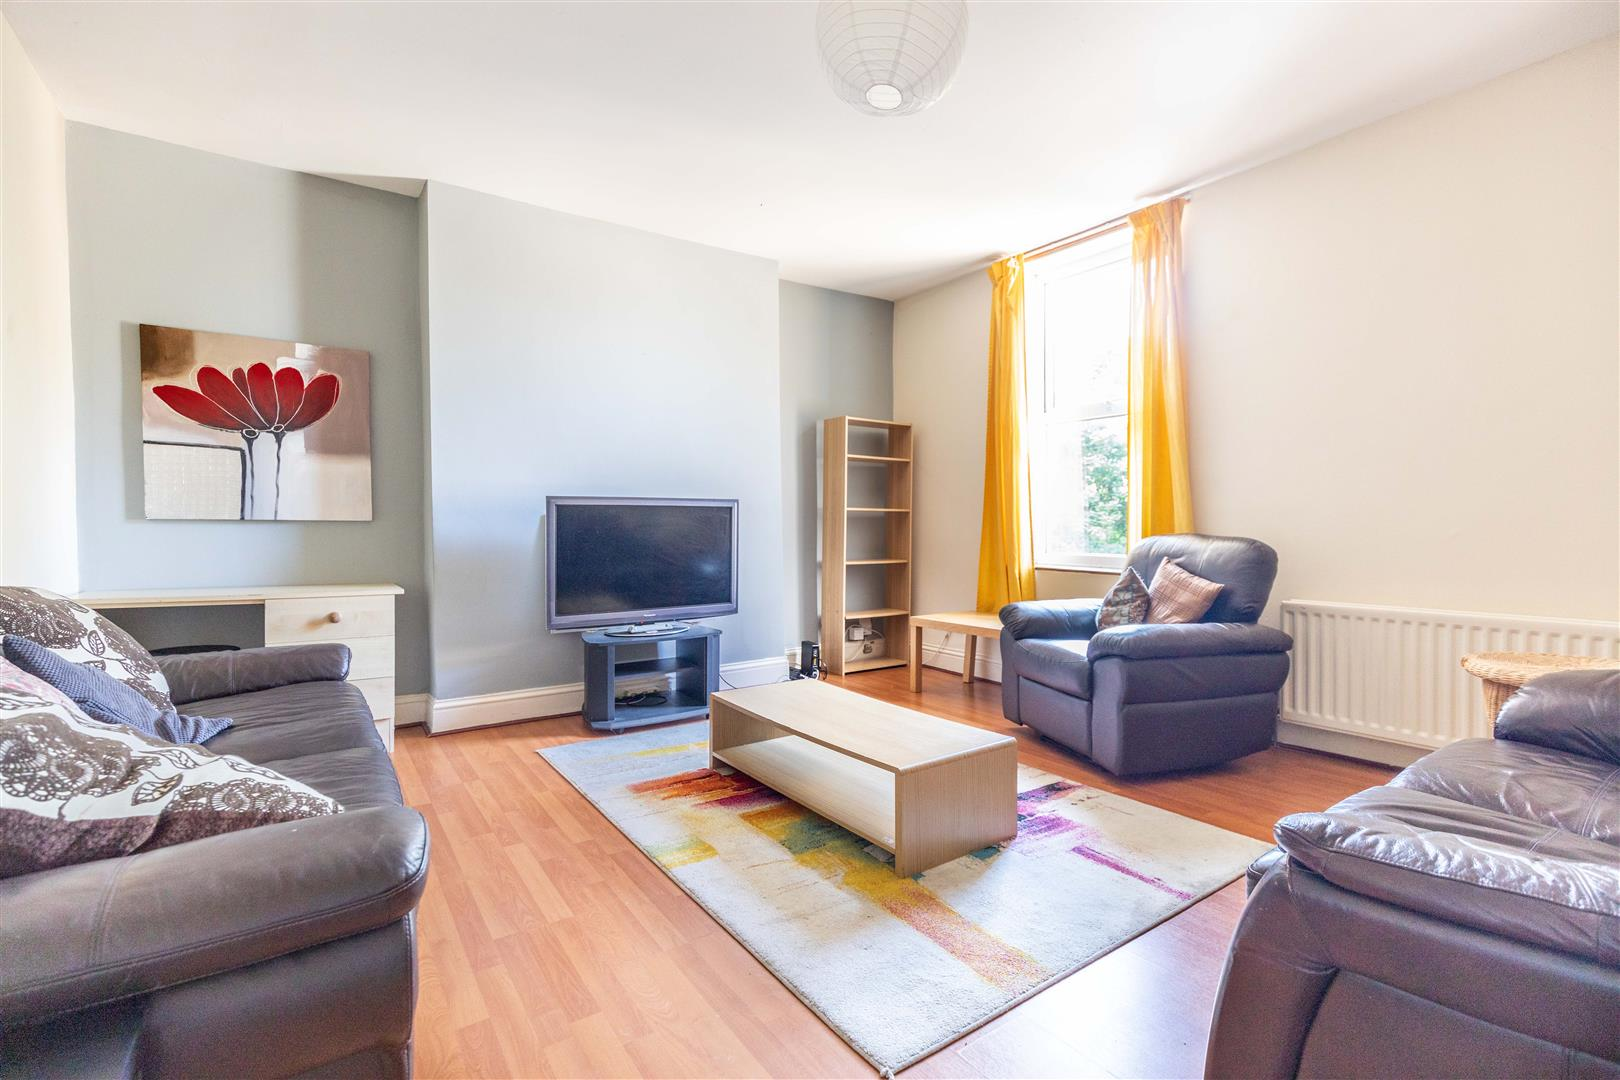 5 bed maisonette to rent in Newcastle Upon Tyne, NE6 5PB 0